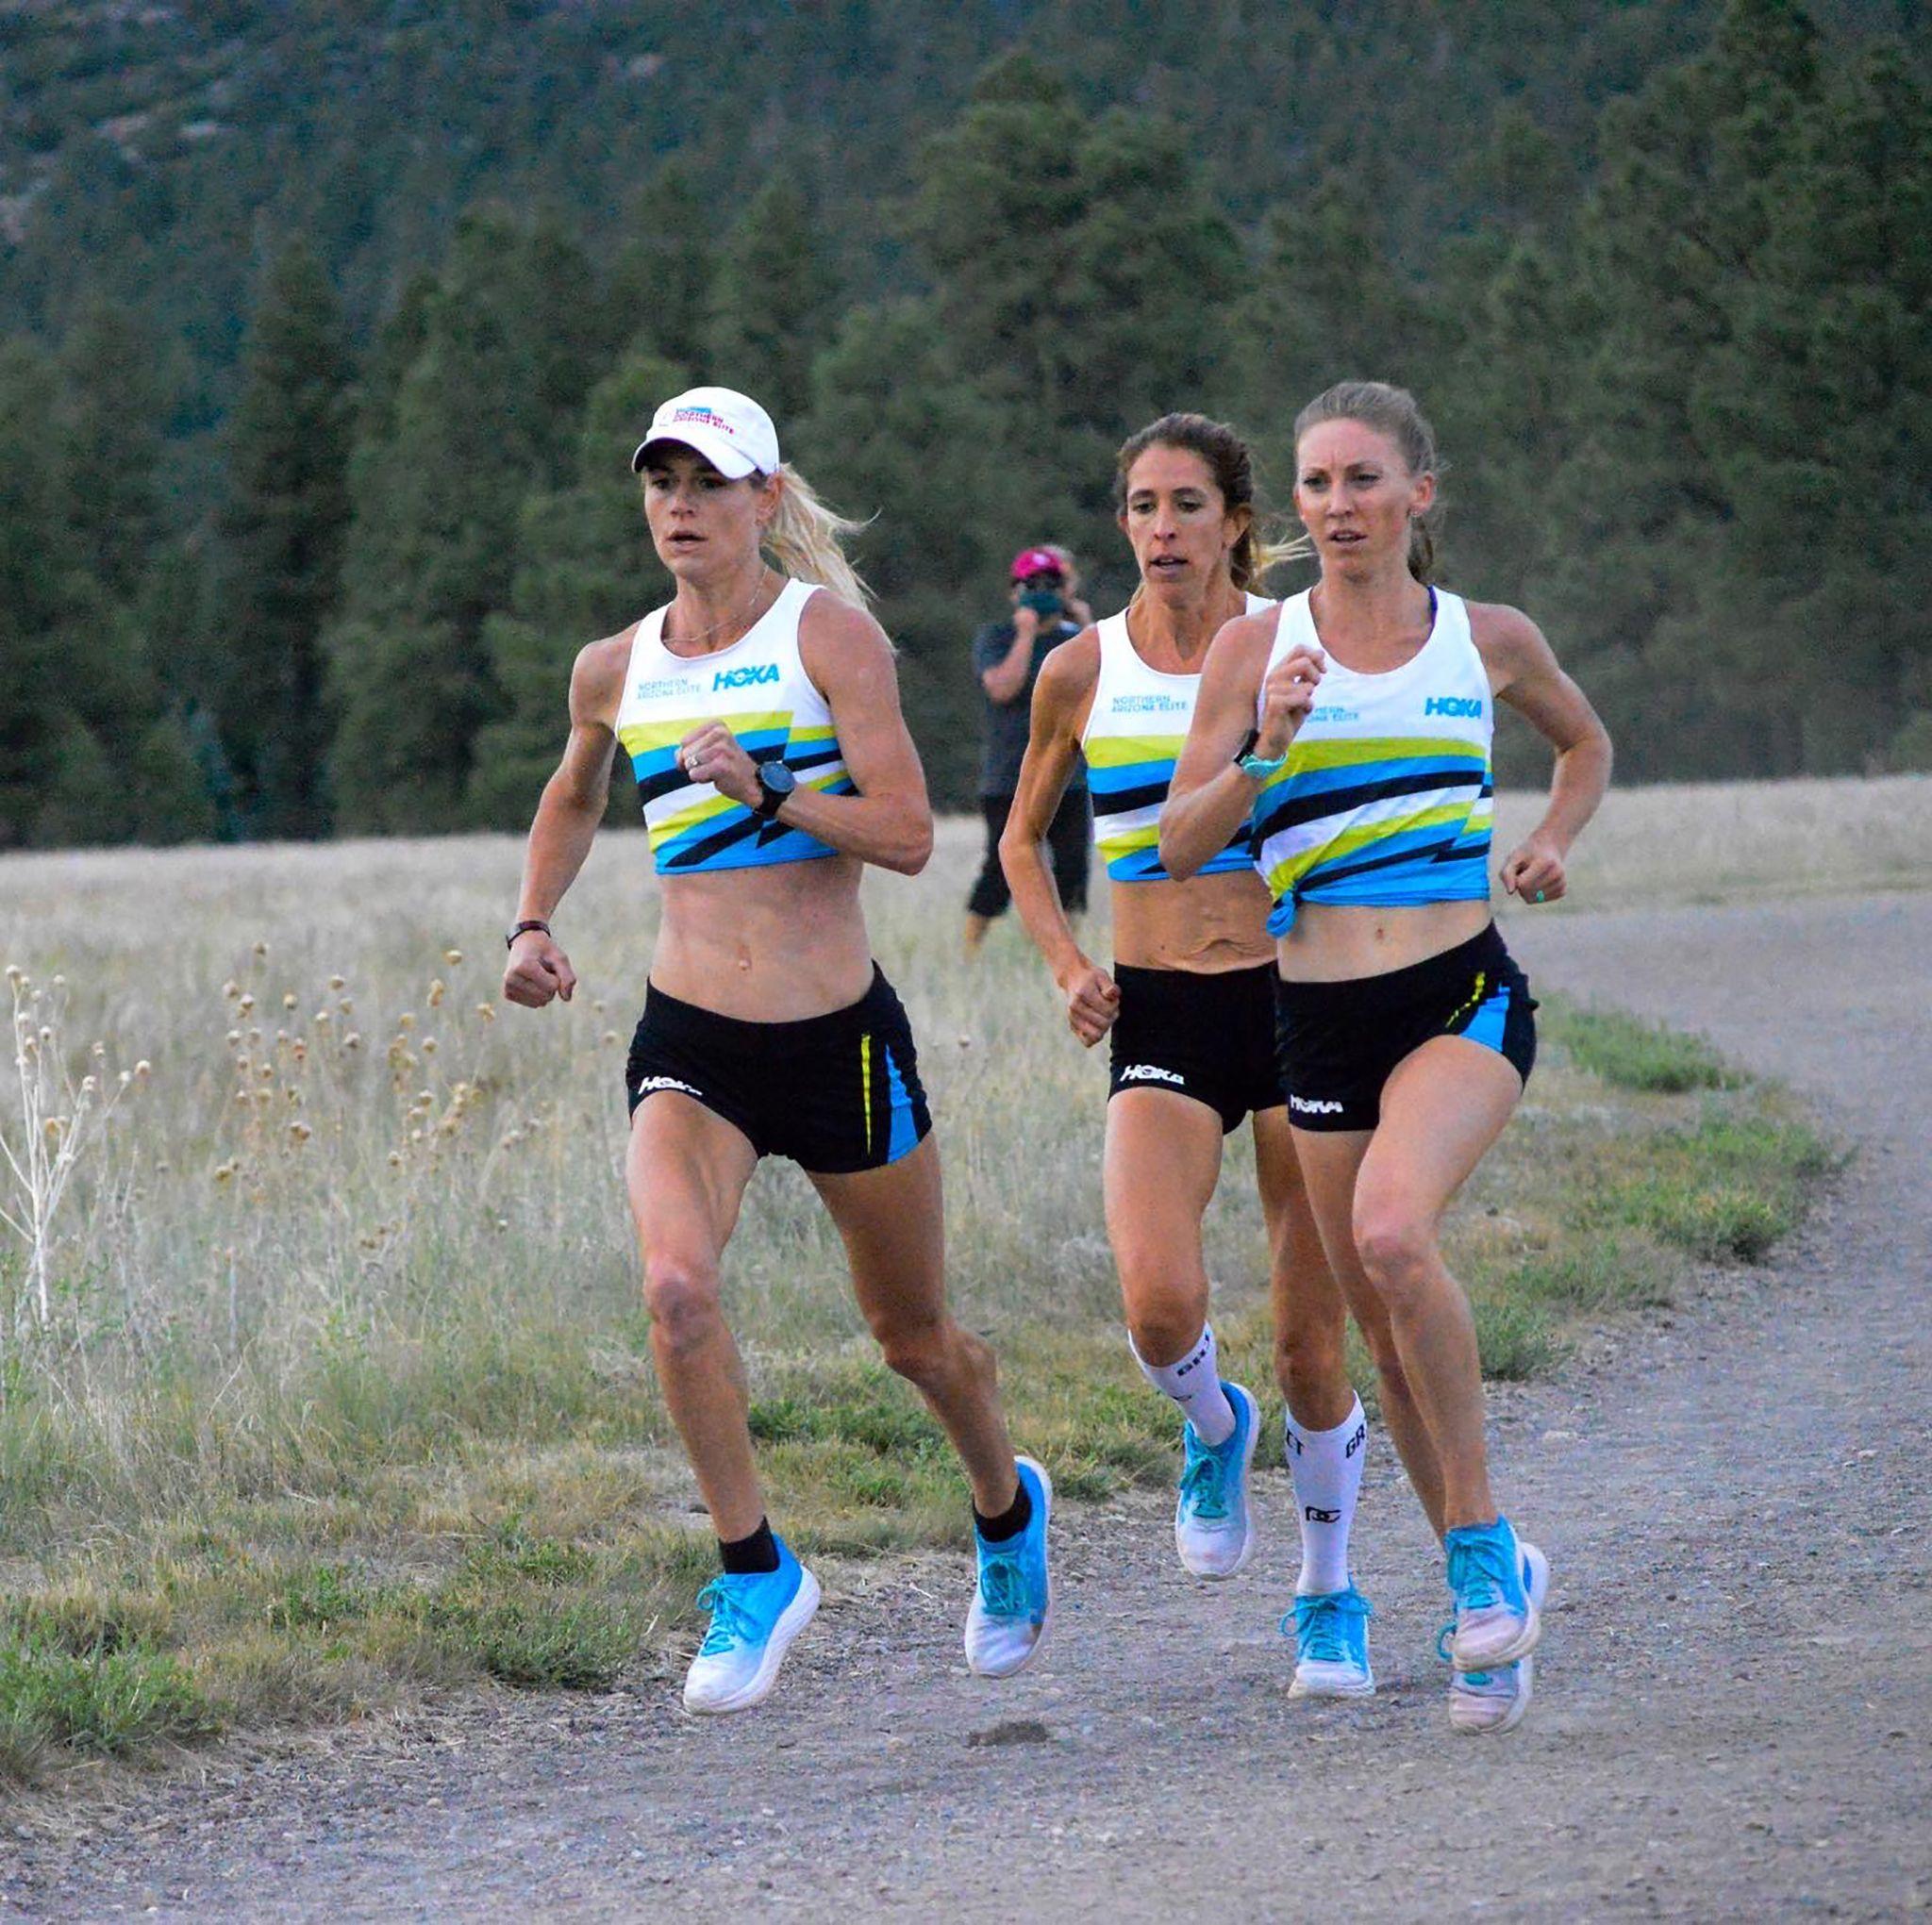 Northern Arizona Elite Sweeps Team Boulder in Virtual Two-Mile Race